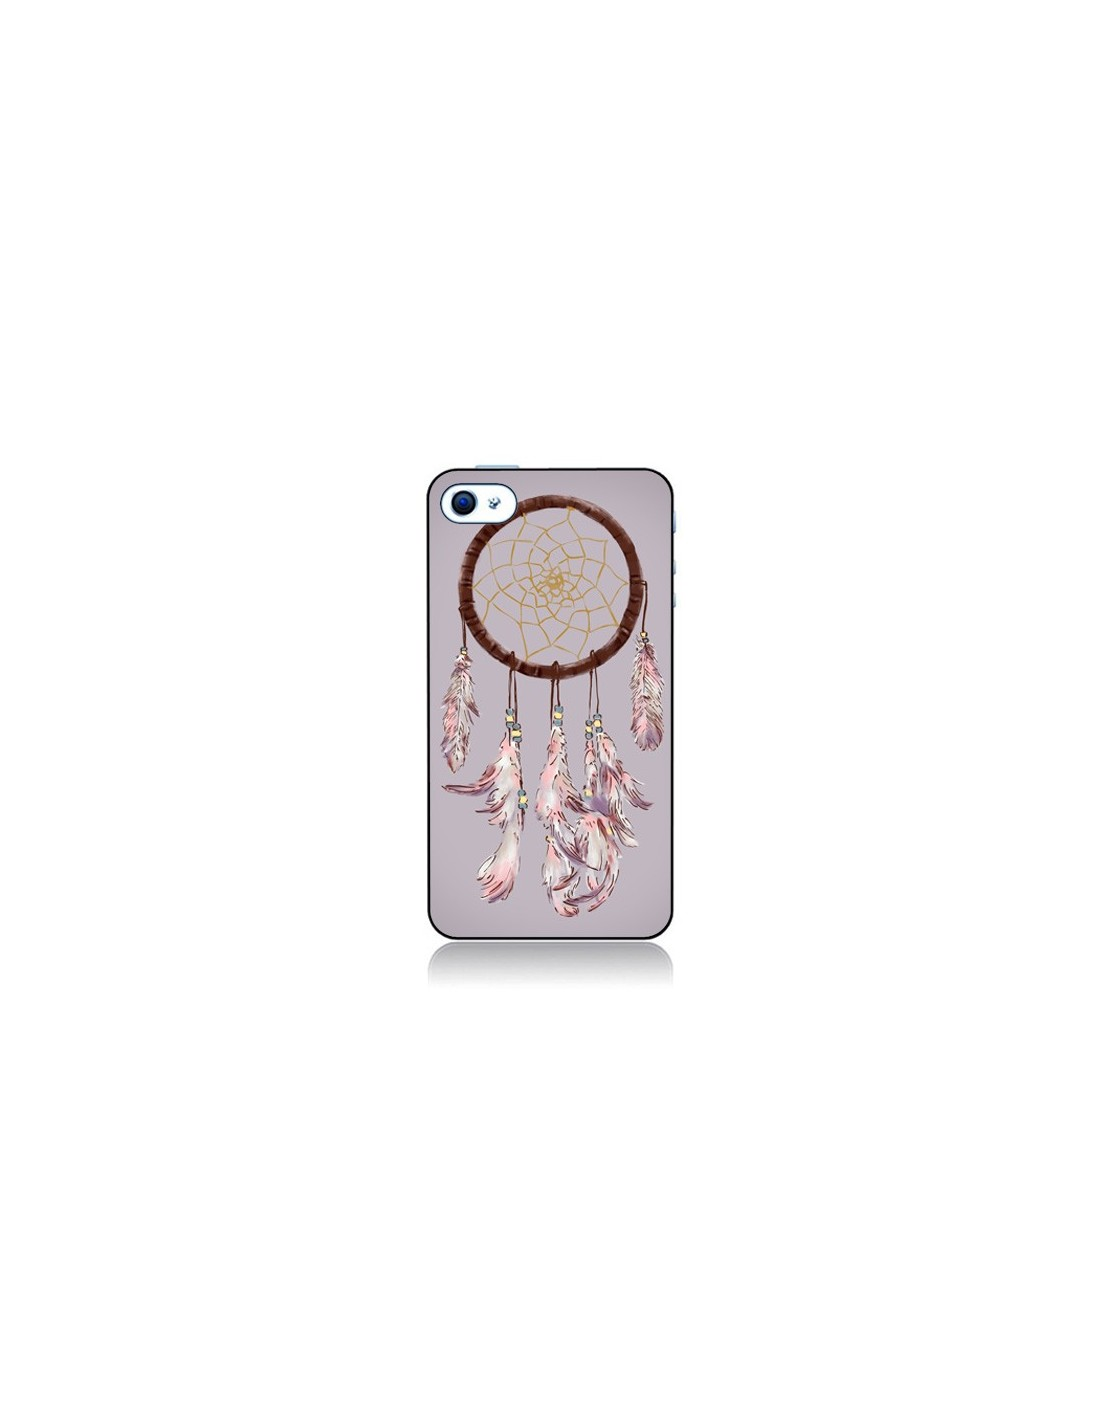 Coque Attrape-rêves violet pour iPhone 4 et 4S - Tipsy Eyes d913a0afa22